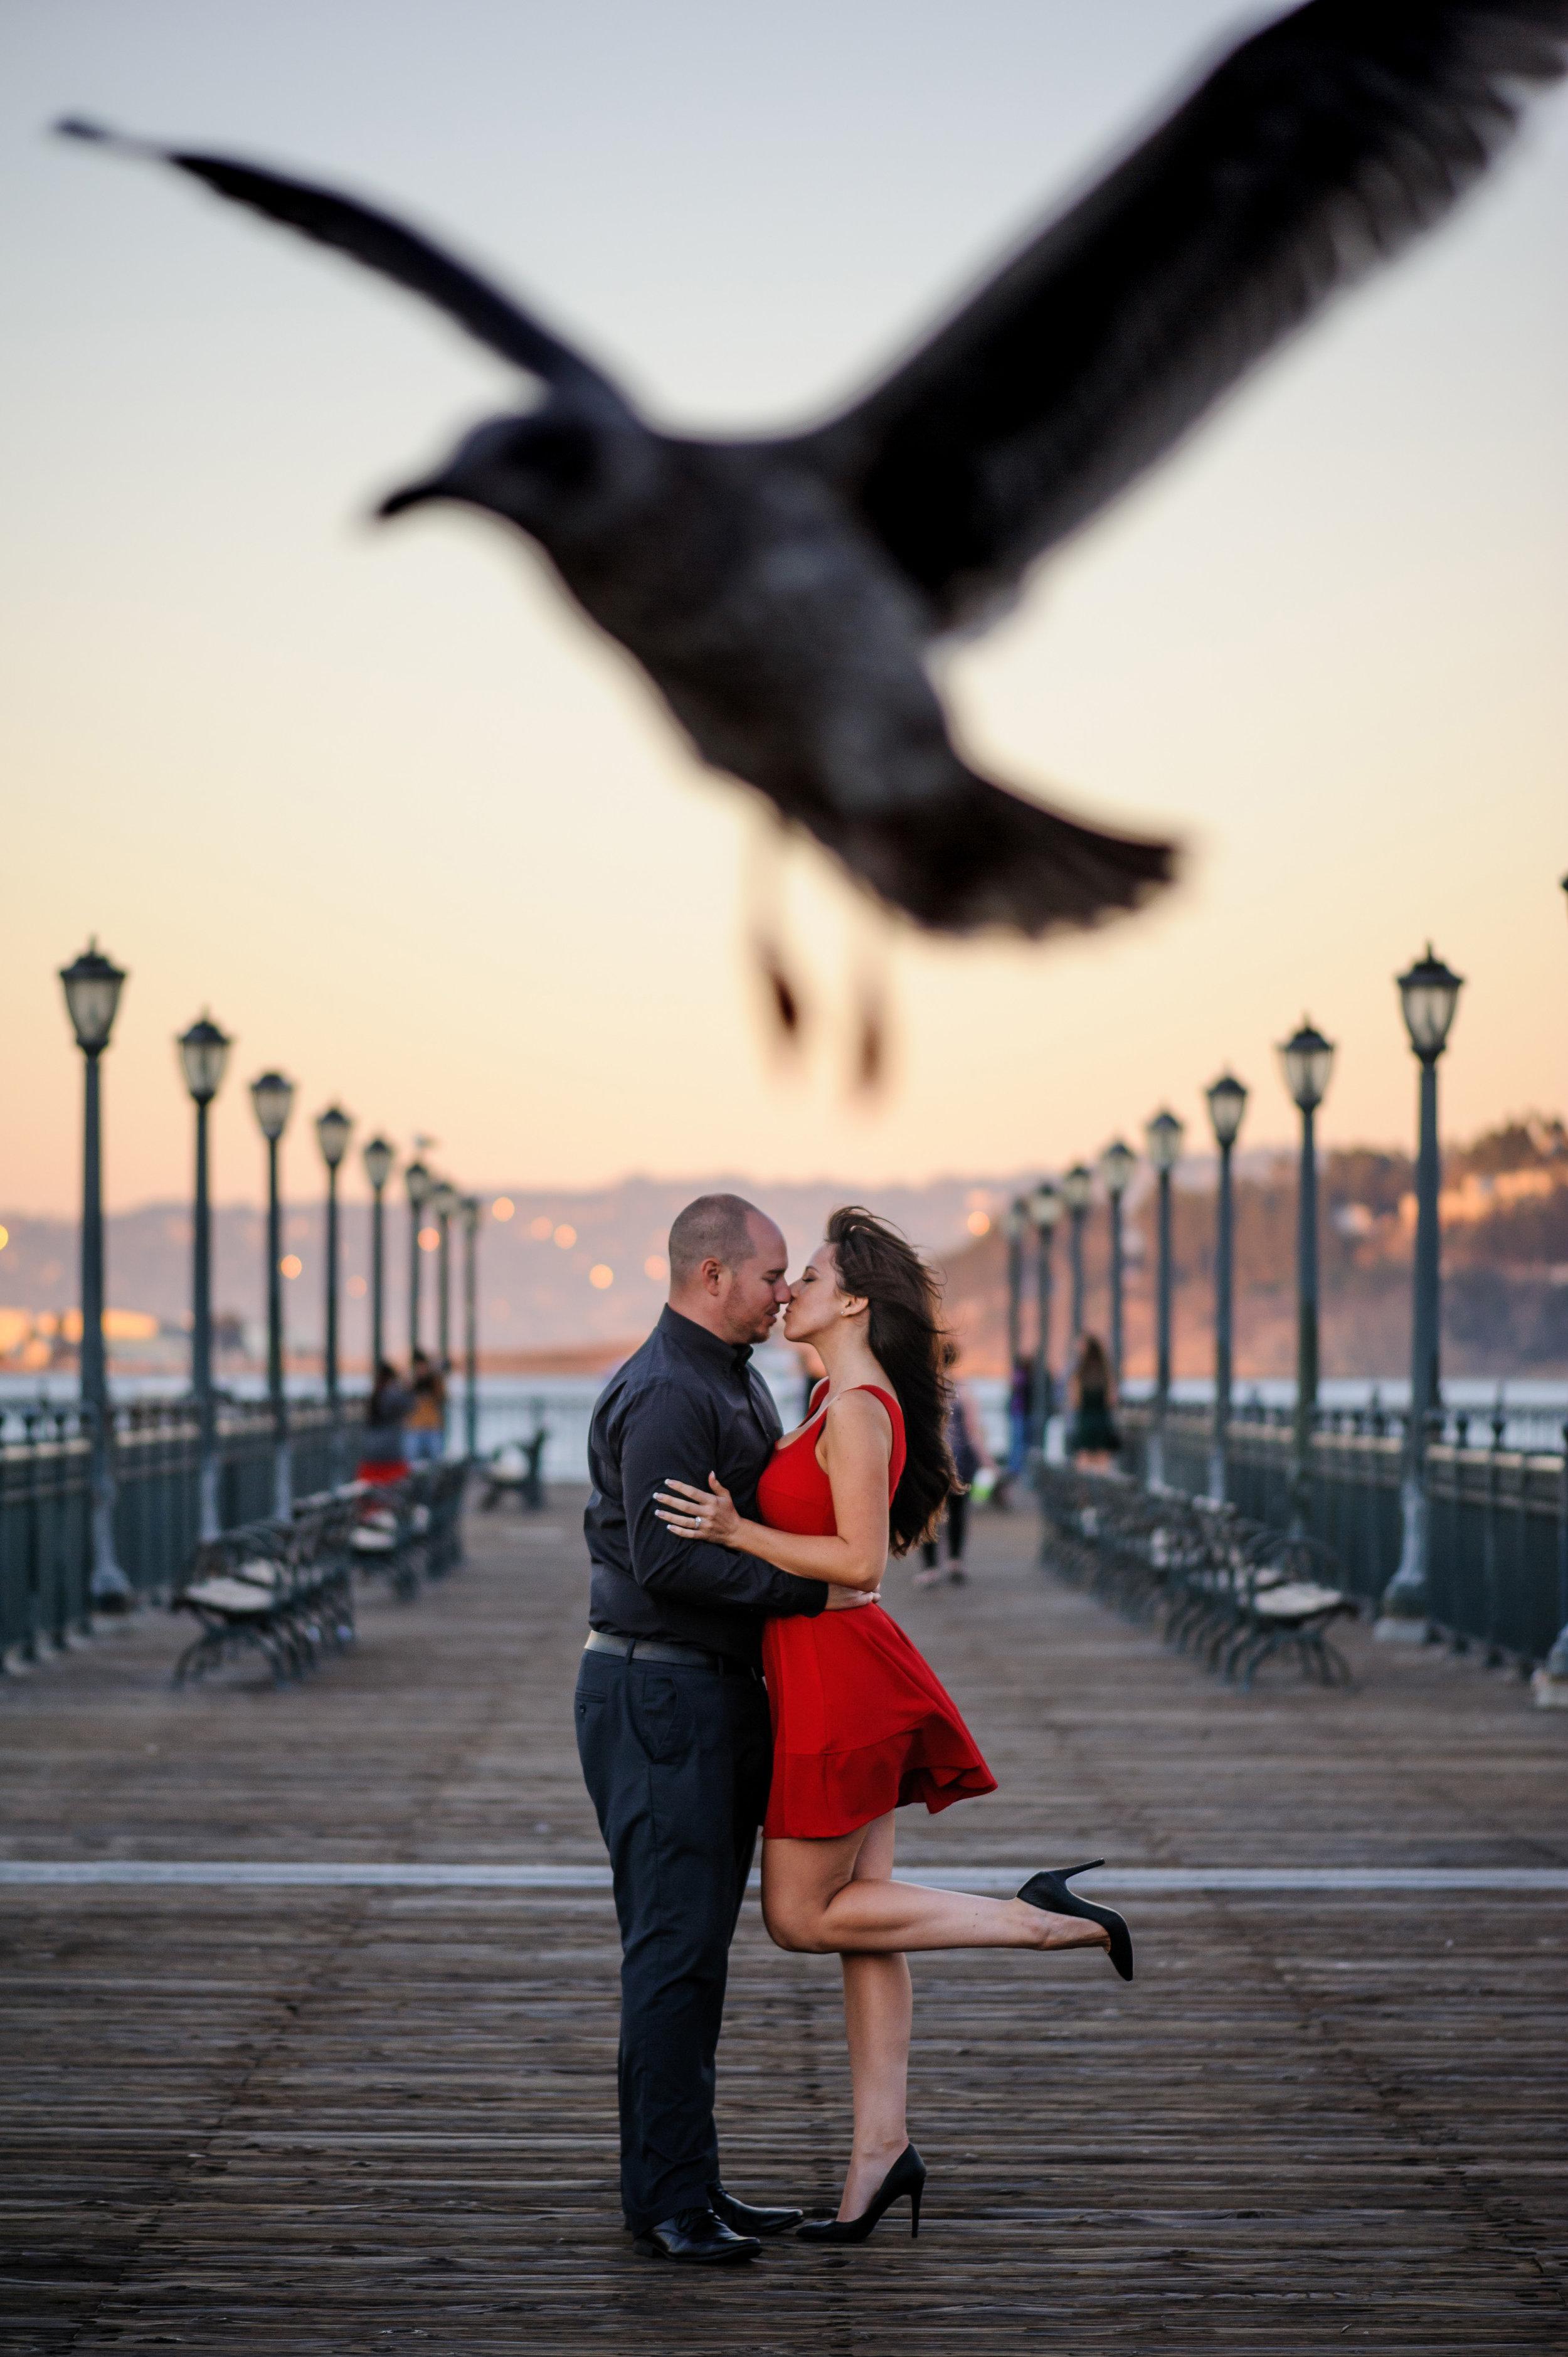 jenny-sean-029-san-francisco-engagement-sacramento-wedding-photographer-katherine-nicole-photography.JPG